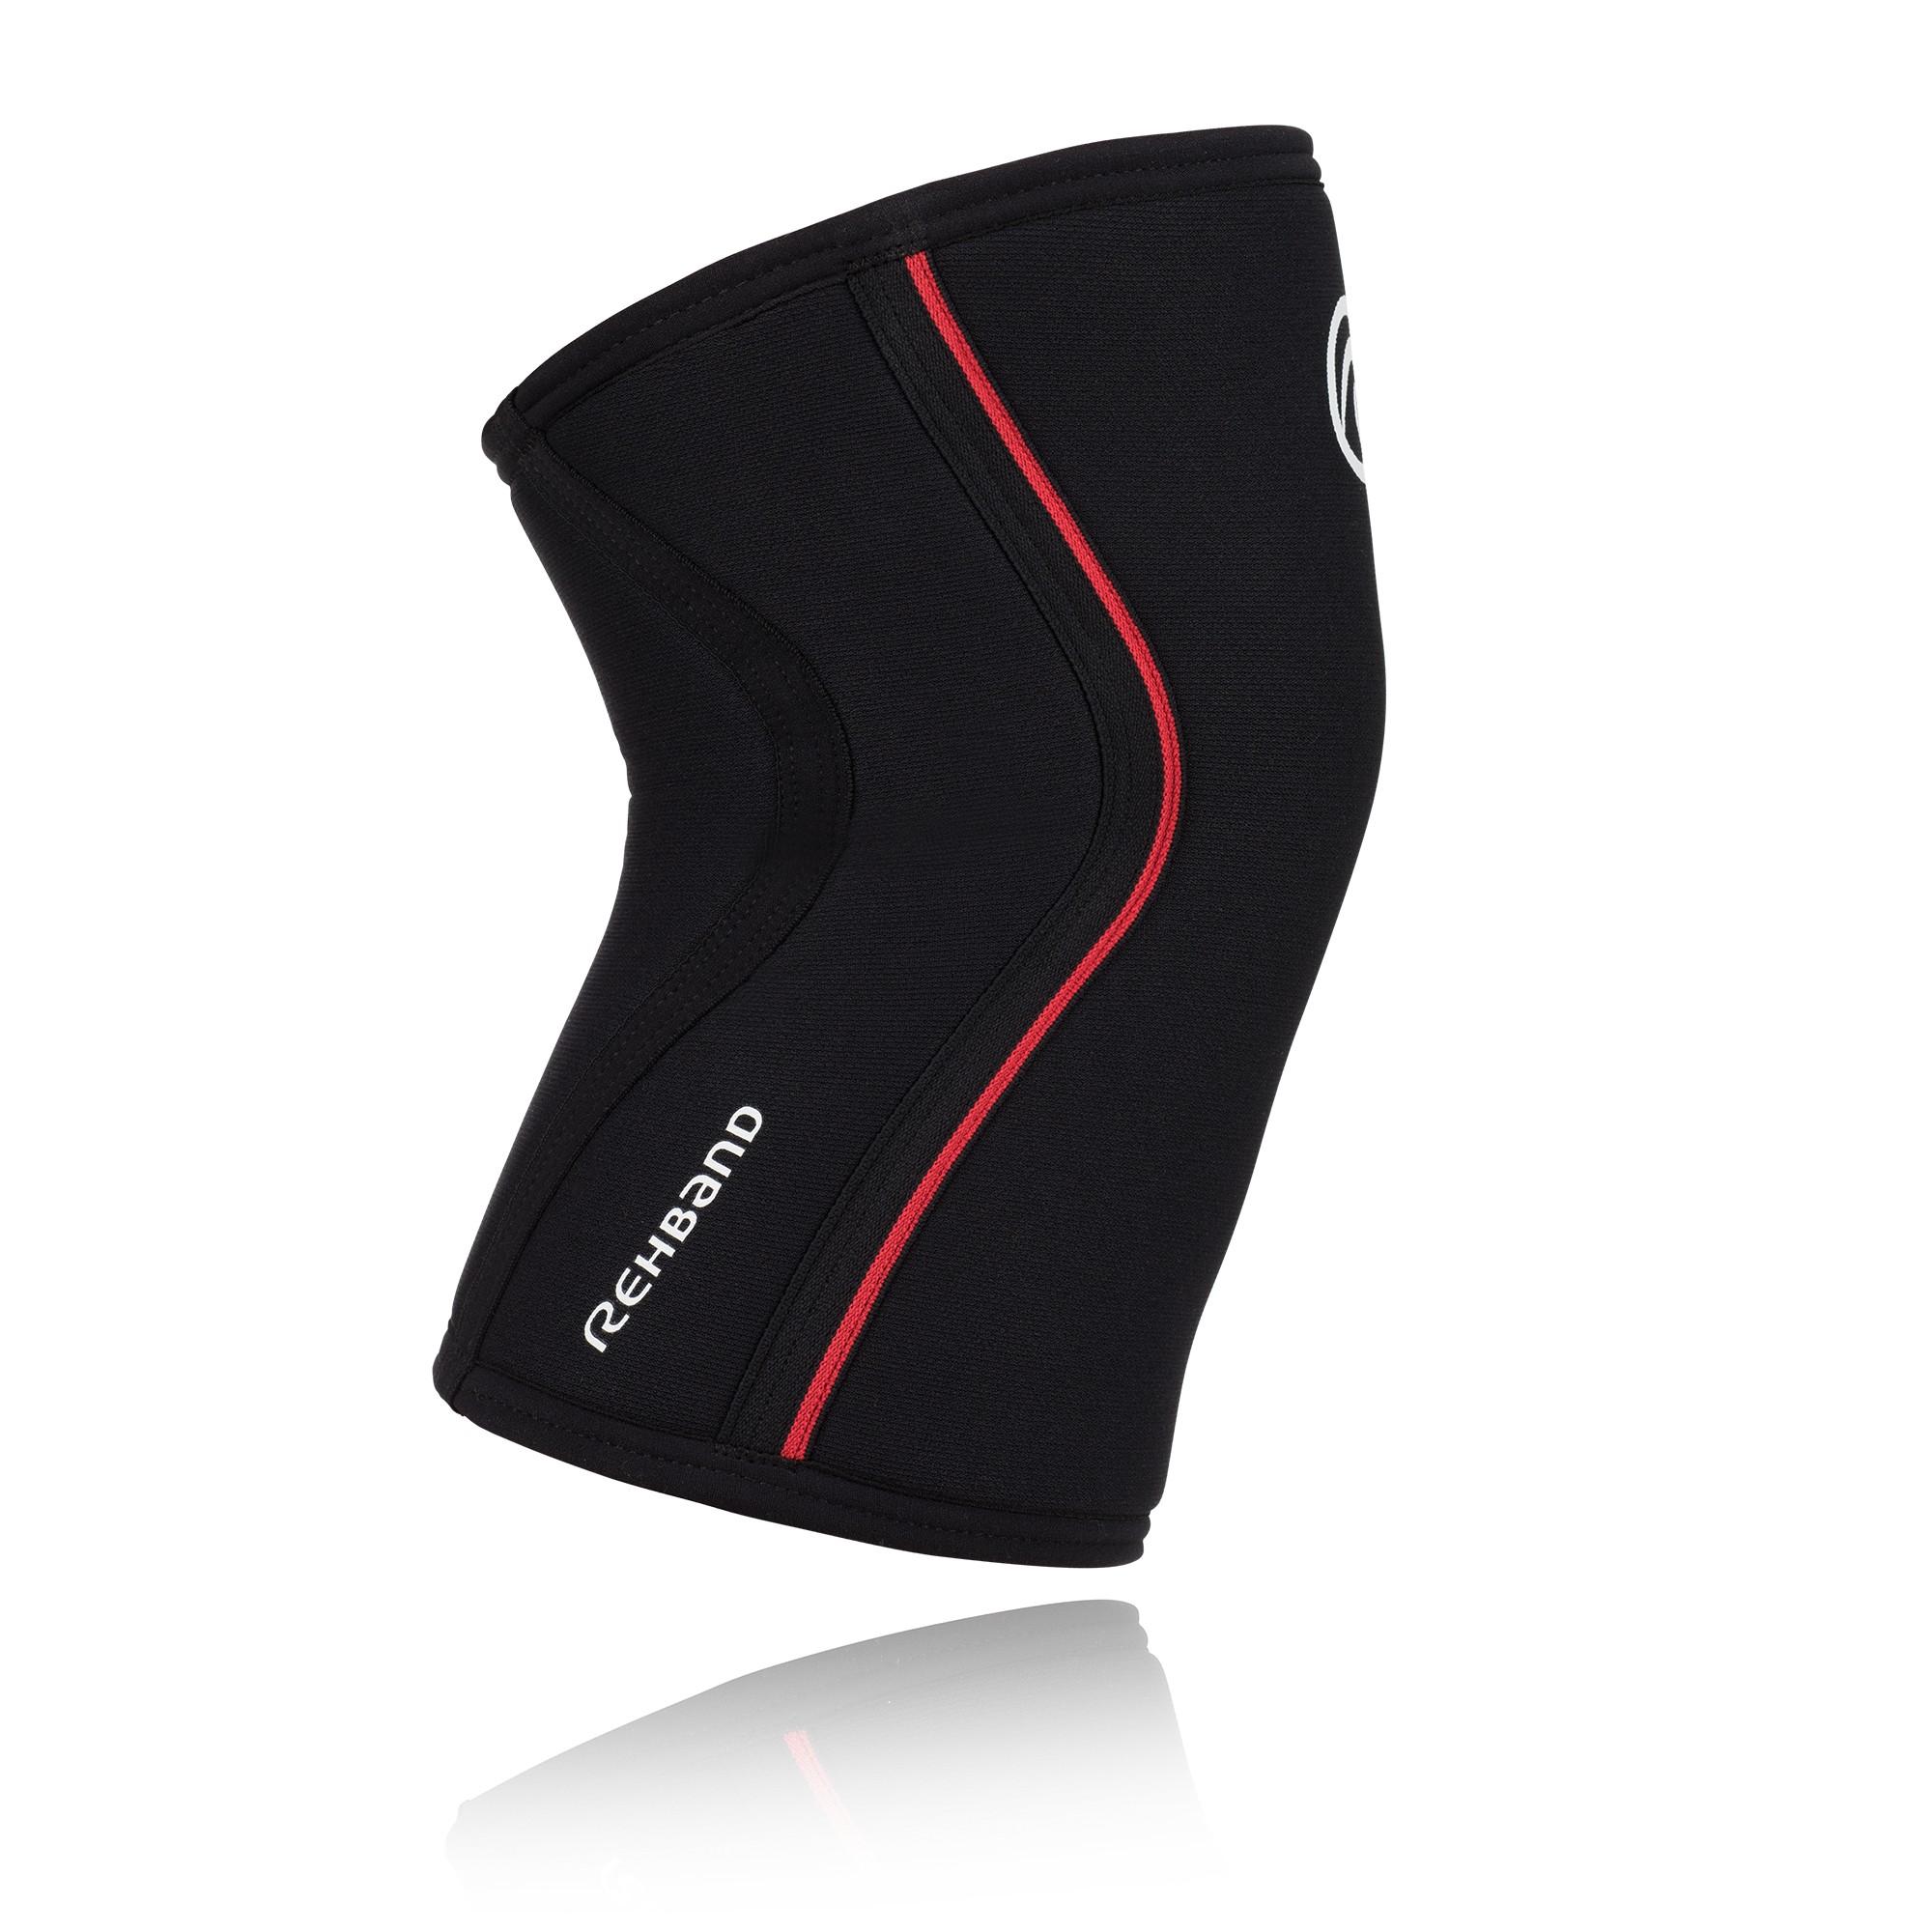 Rehband RX Kniebandage schwarz/rot